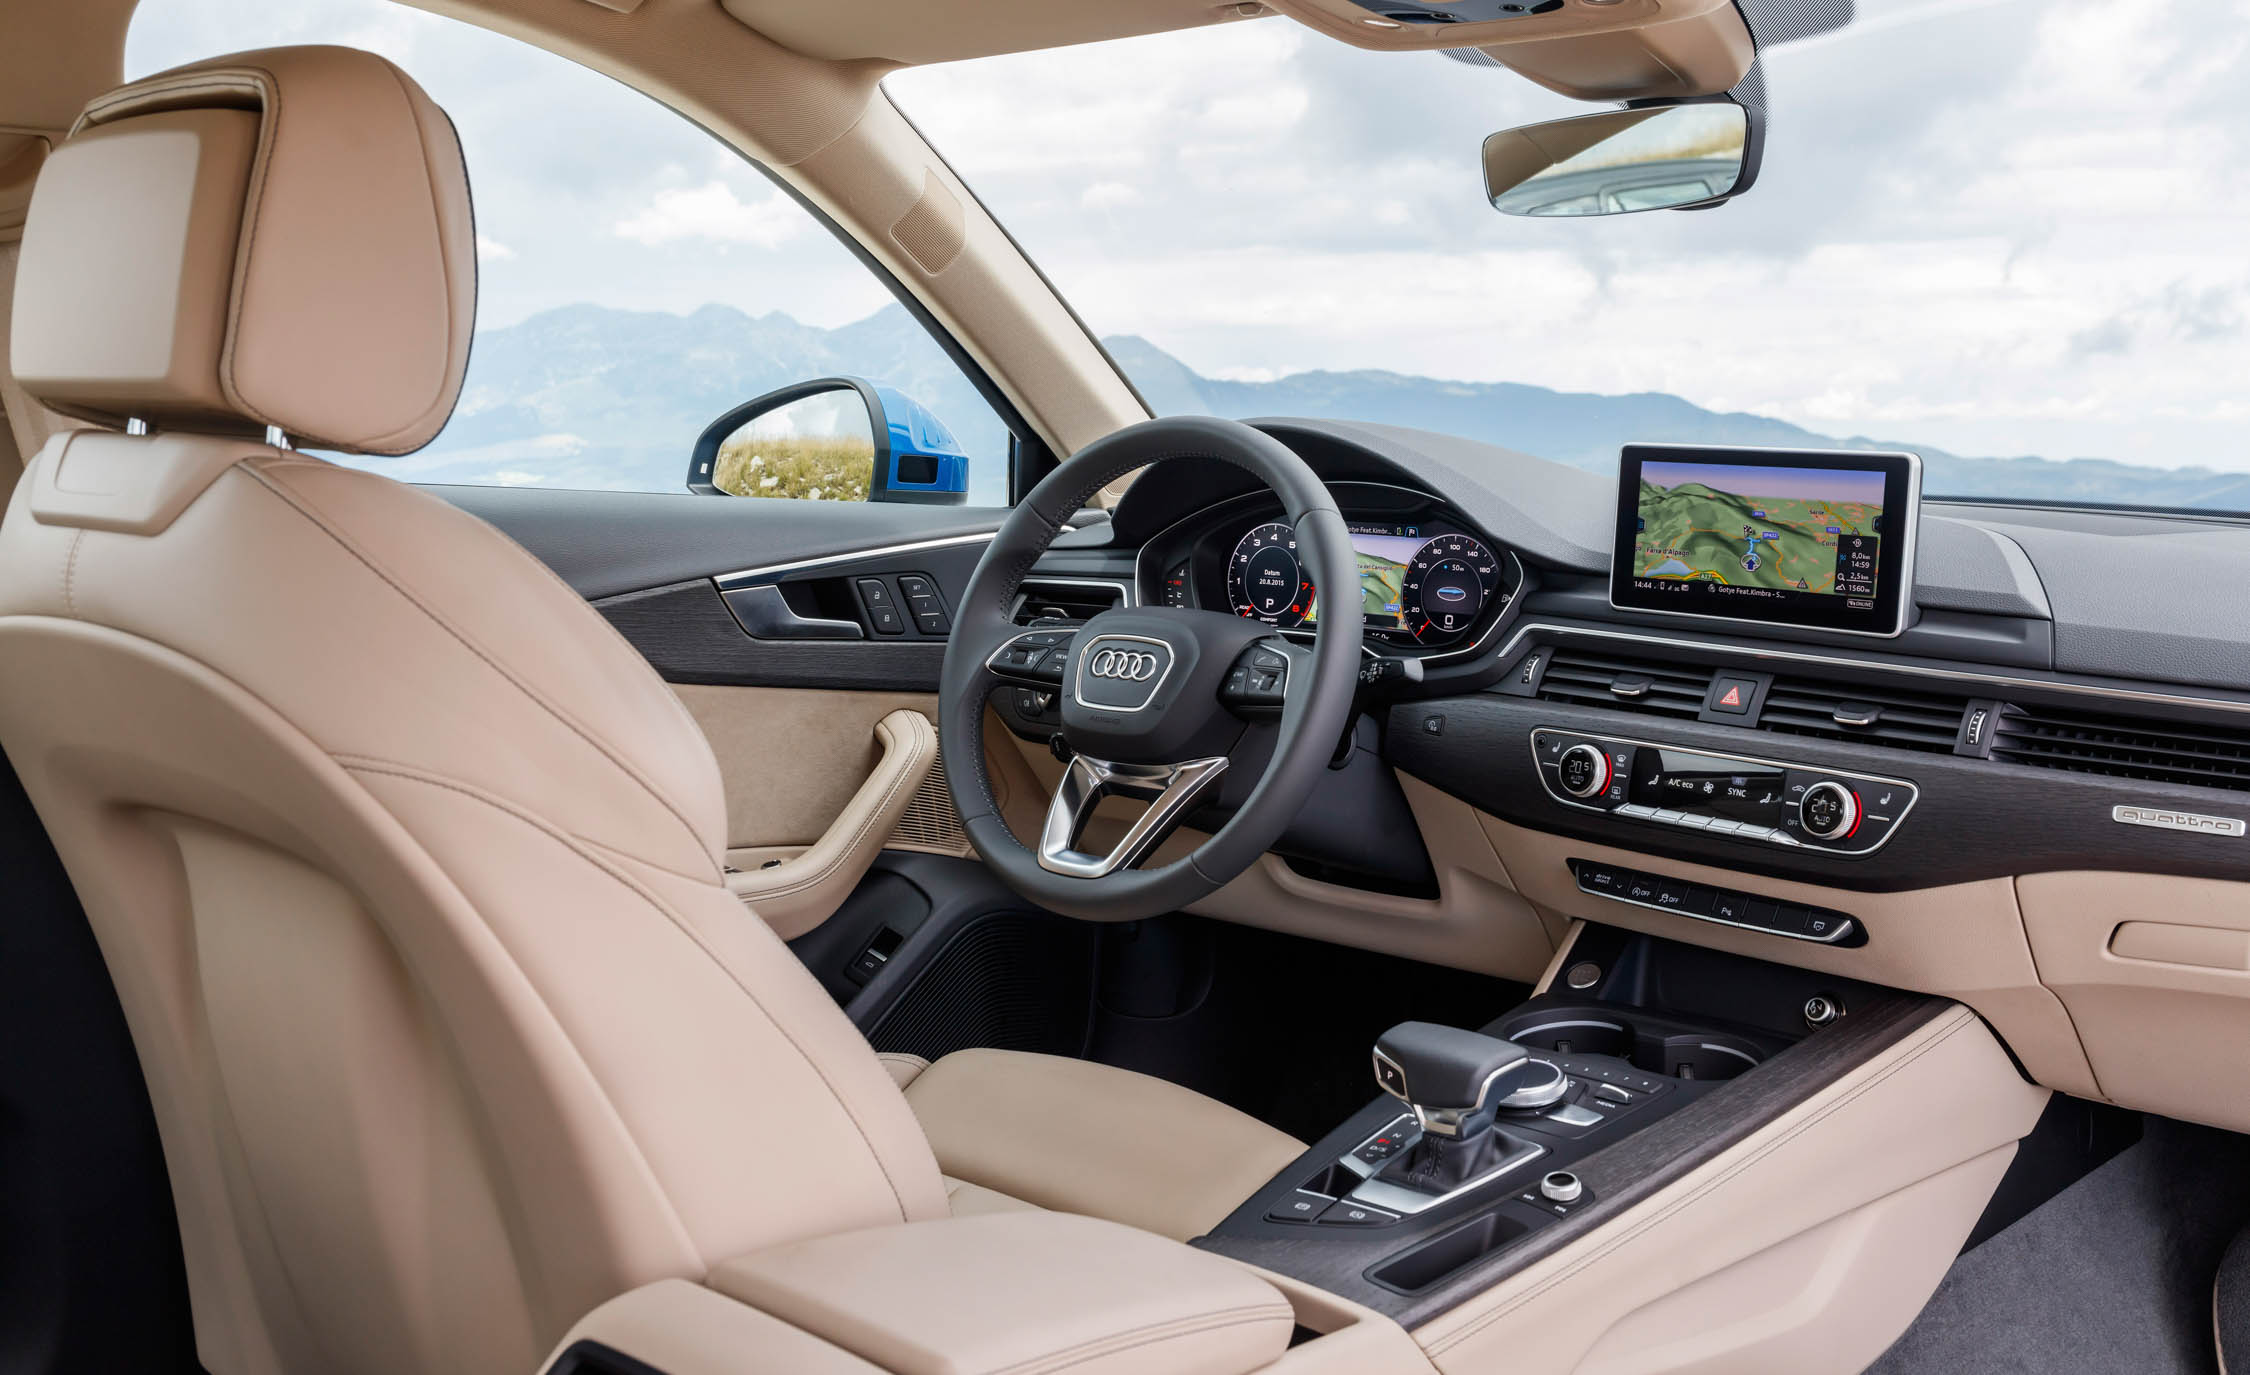 Sorta A4ordable: All-New 2017 Audi A4 Still Starts Under $40,000 2